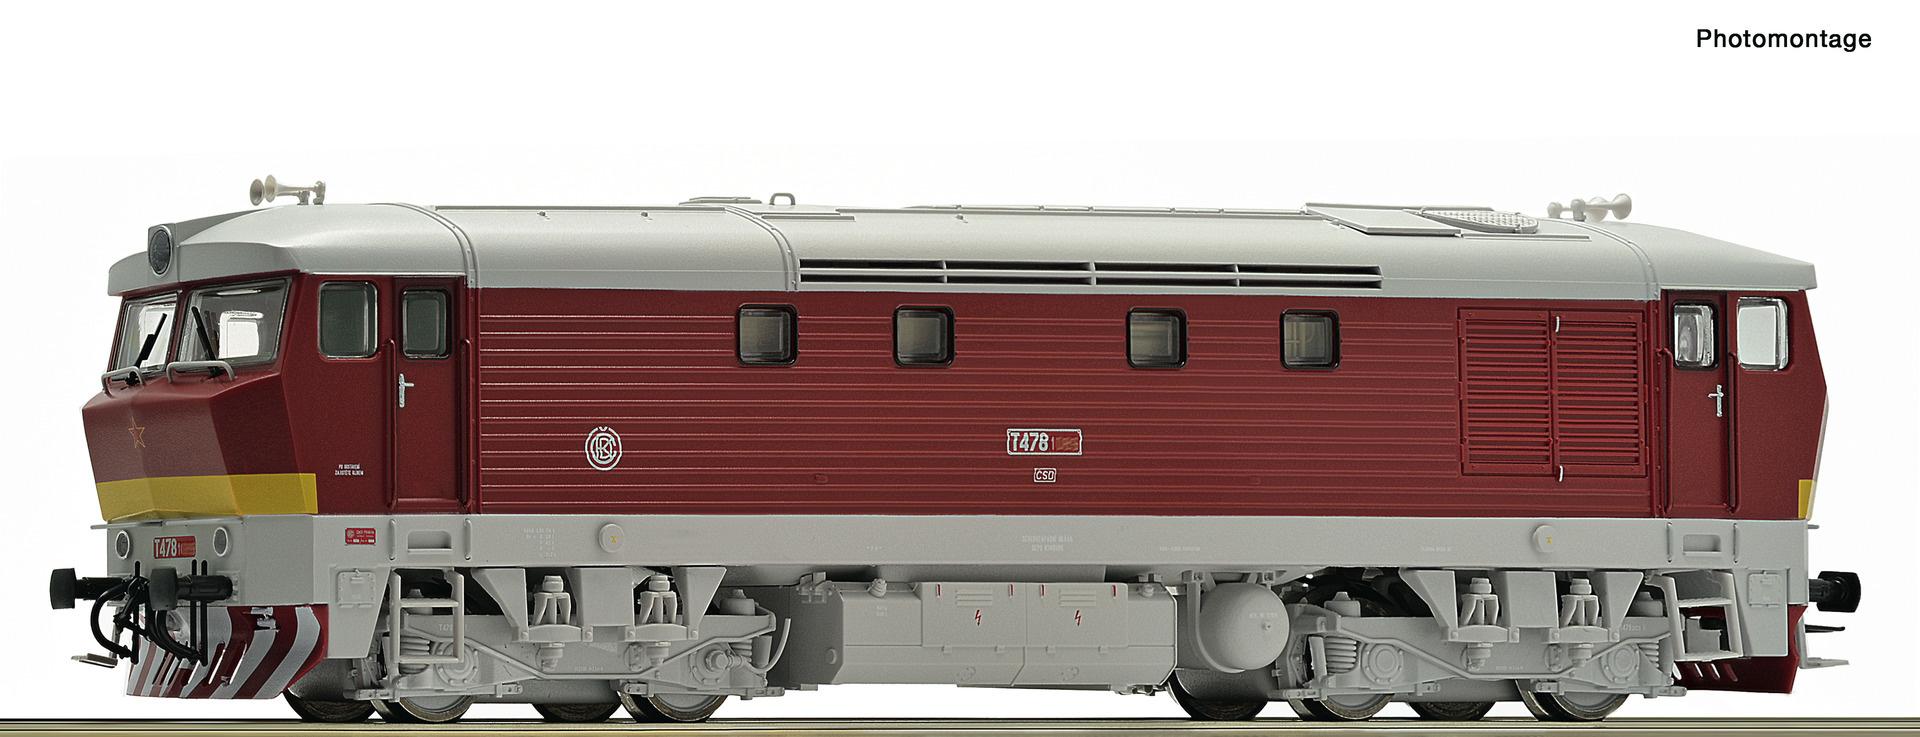 70920 Diesellok T478.1 CSD-1